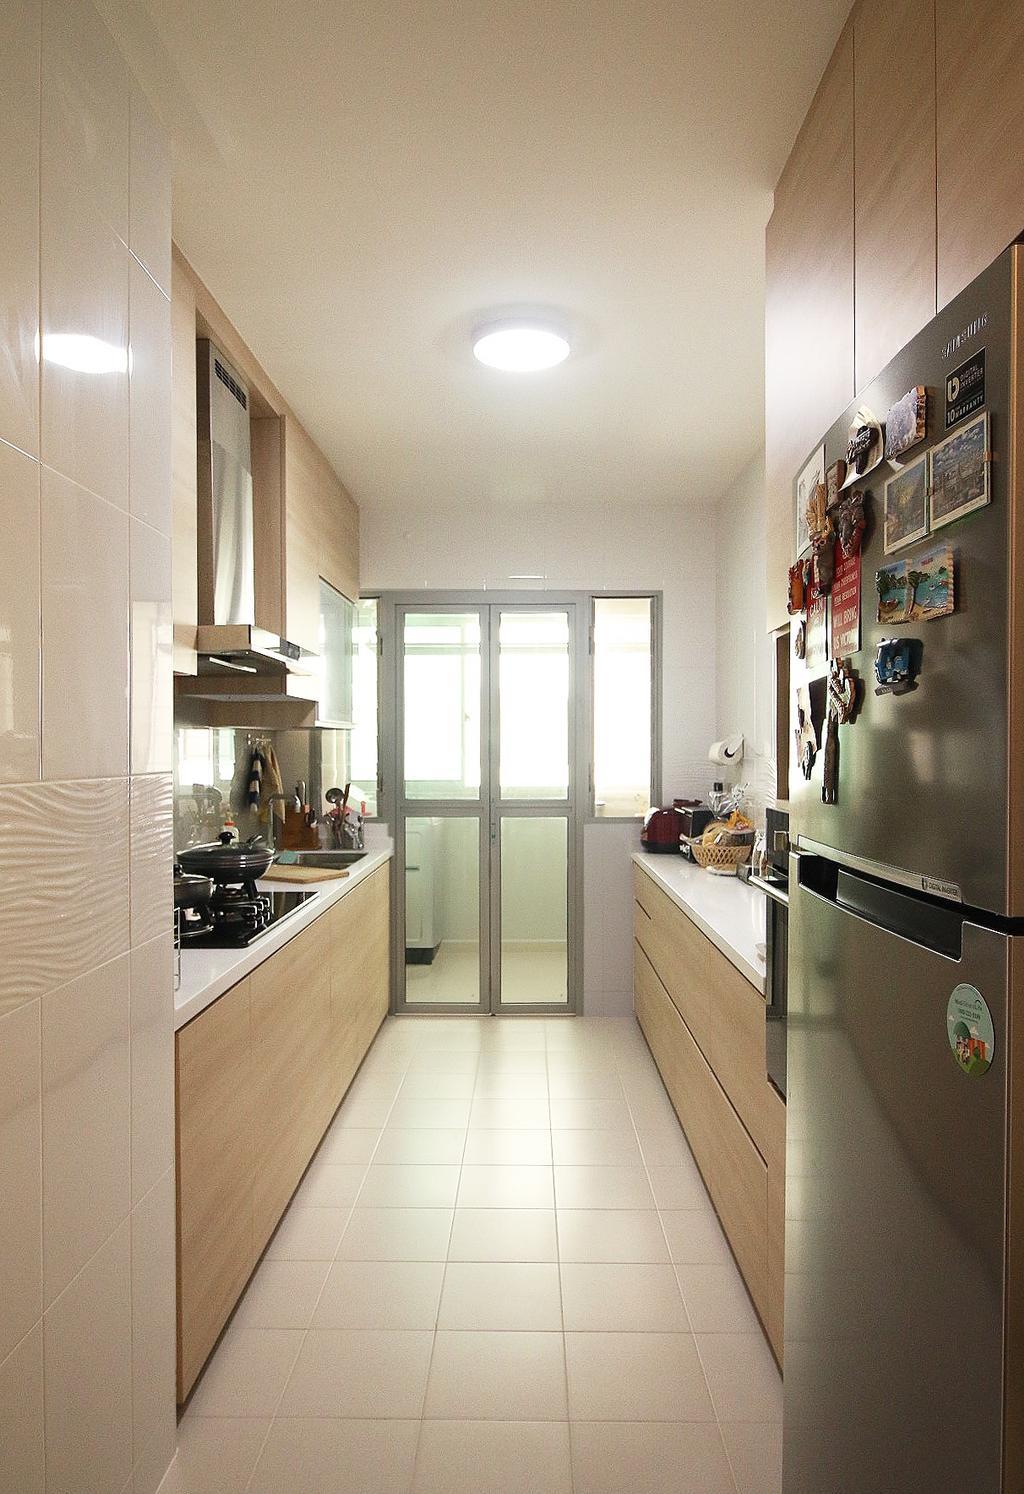 Scandinavian, HDB, Kitchen, Fajar Road (Blk 443B), Interior Designer, ChanInteriors, Sink, Appliance, Electrical Device, Oven, Indoors, Interior Design, Room